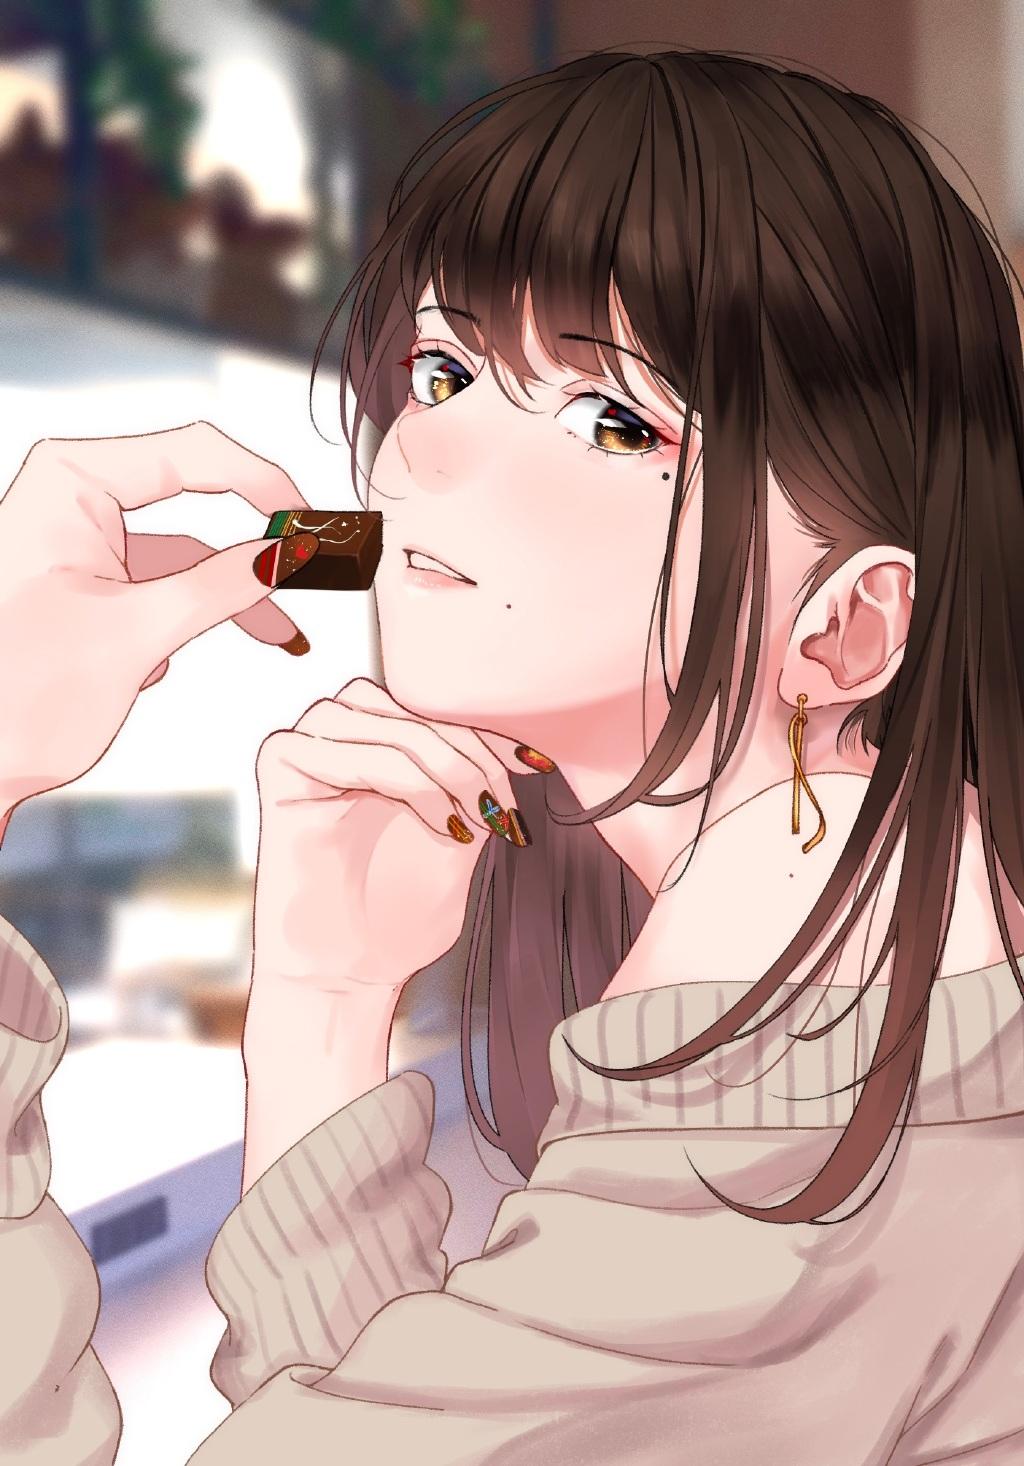 P站精选&黑丝、泪痣与眼镜娘!日本画师サイトー的插画作品